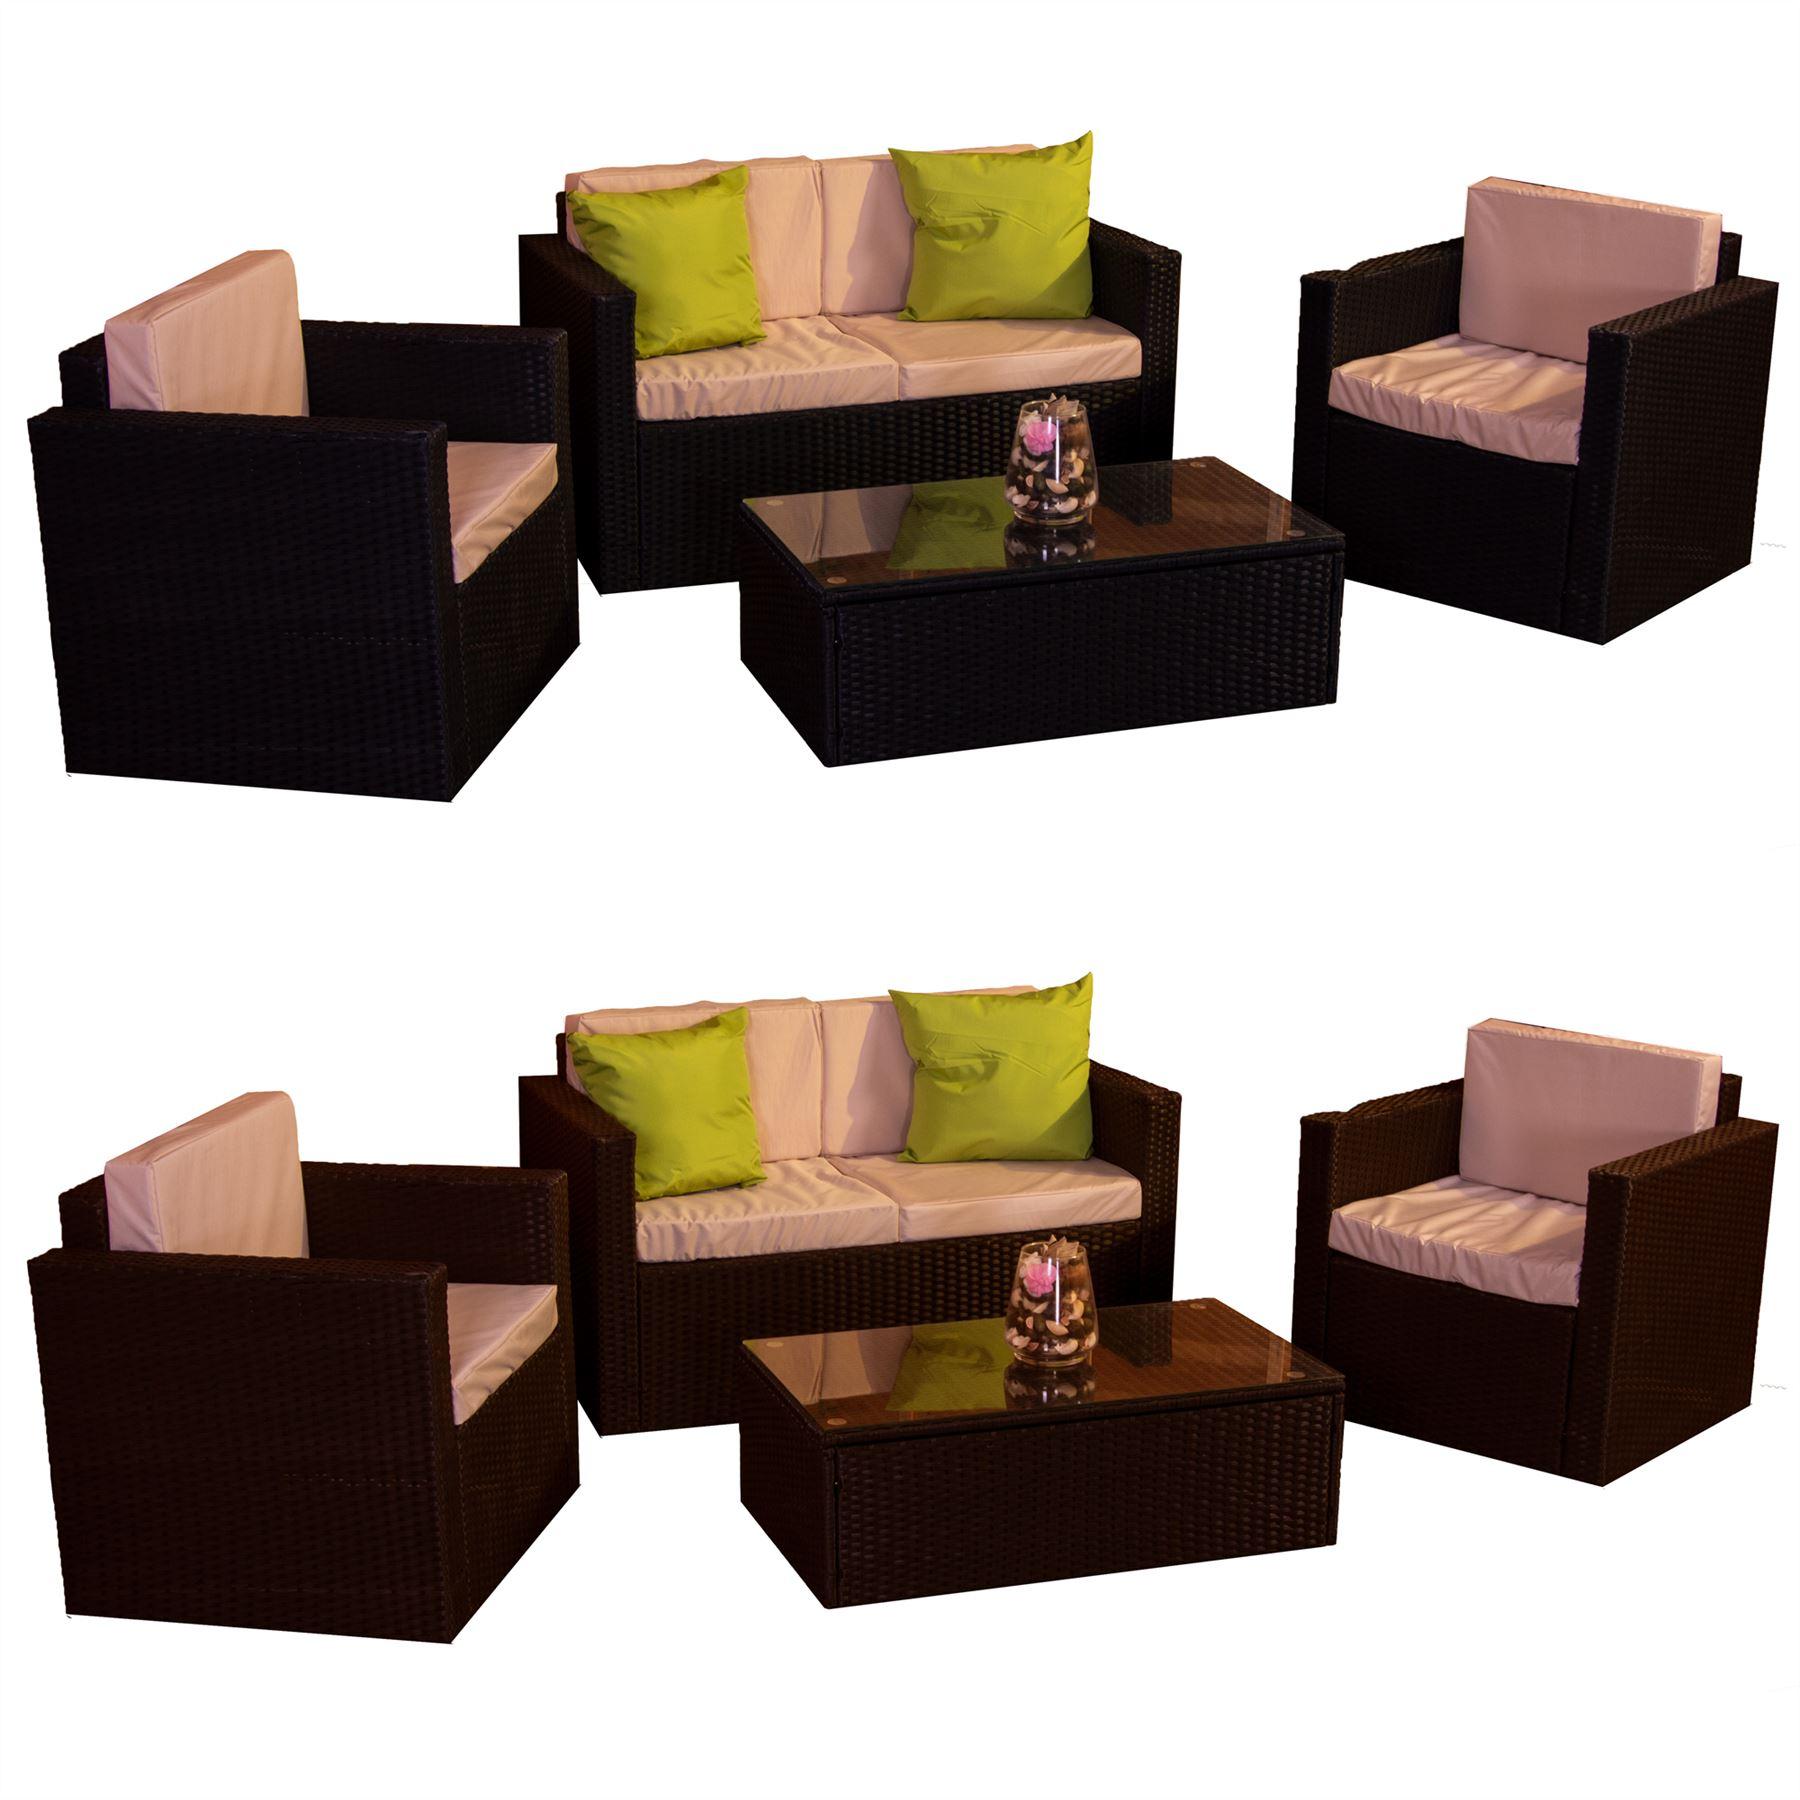 Alton garden rattan furniture 4 seater set black brown outdoor table patio ukfr